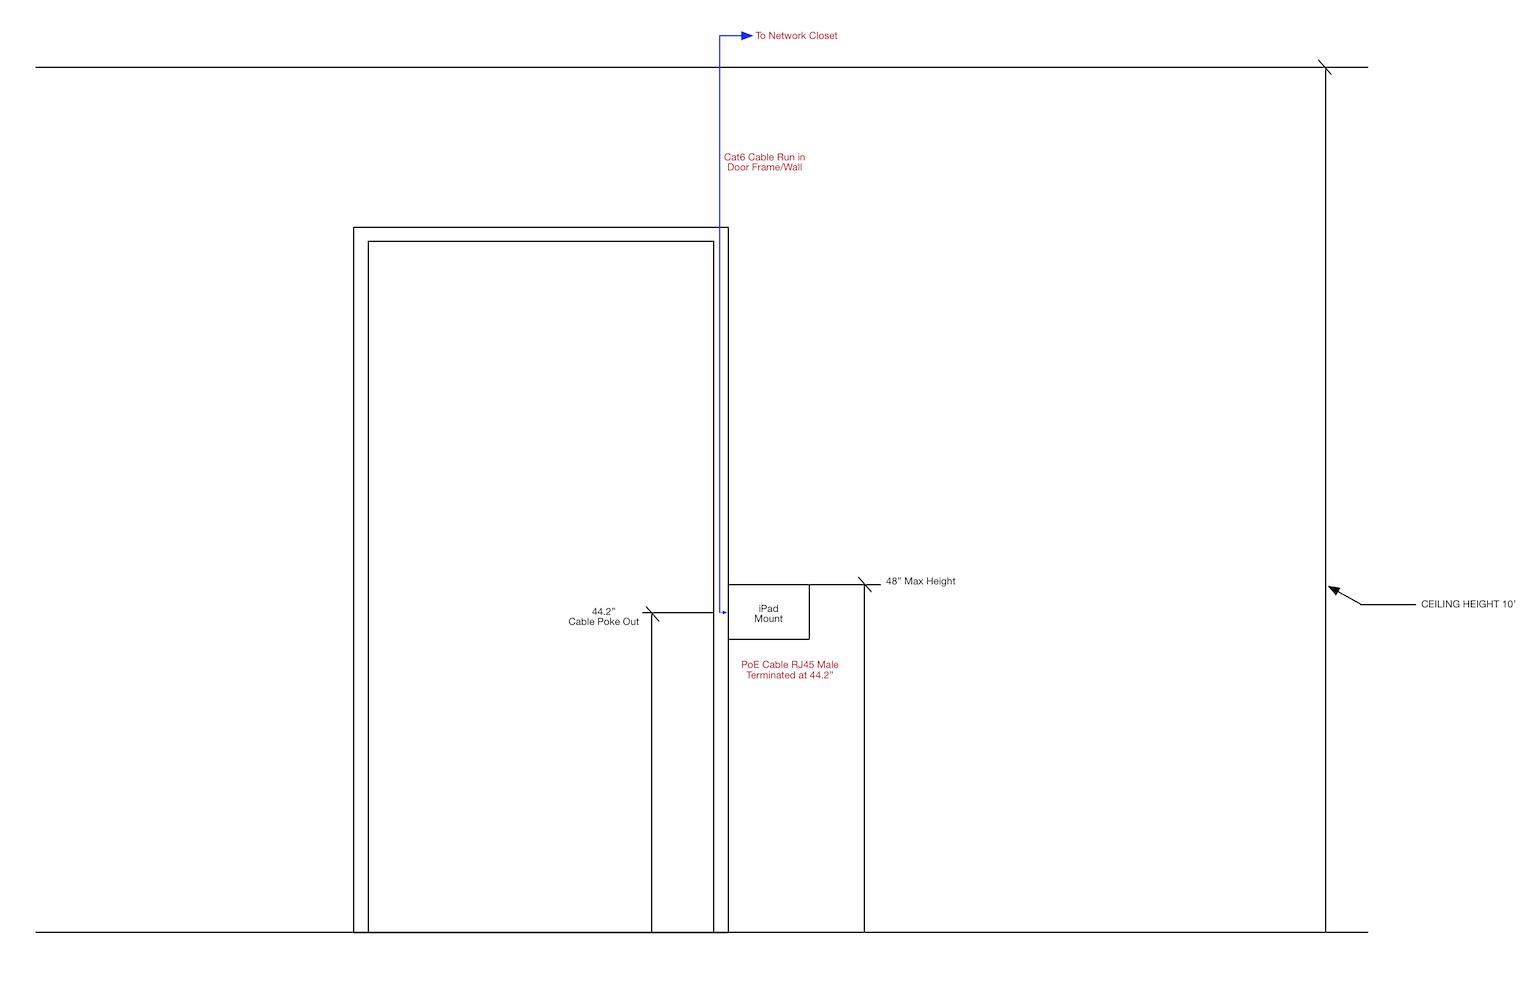 Scheduling Display